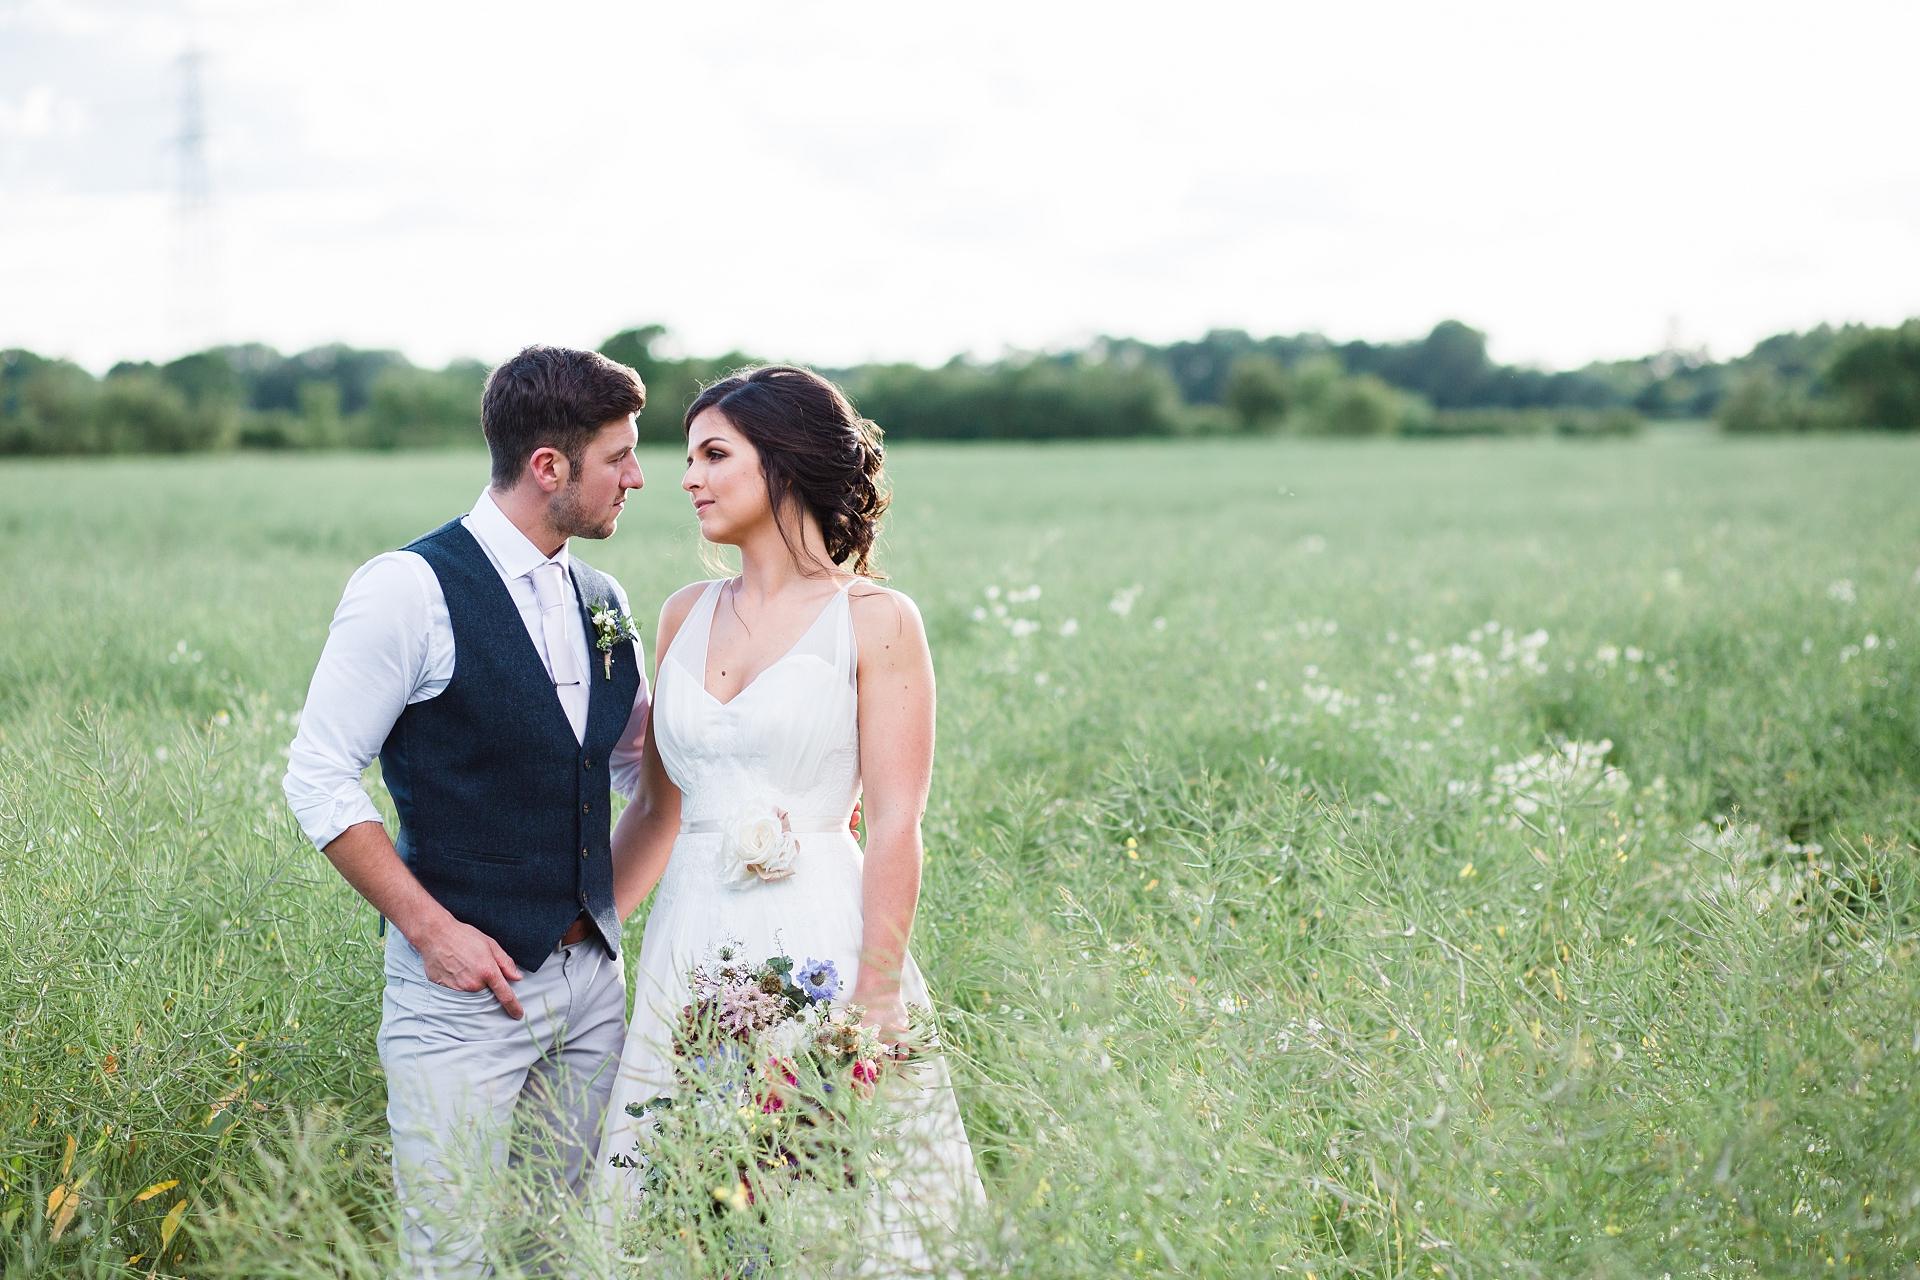 my wedding photography style